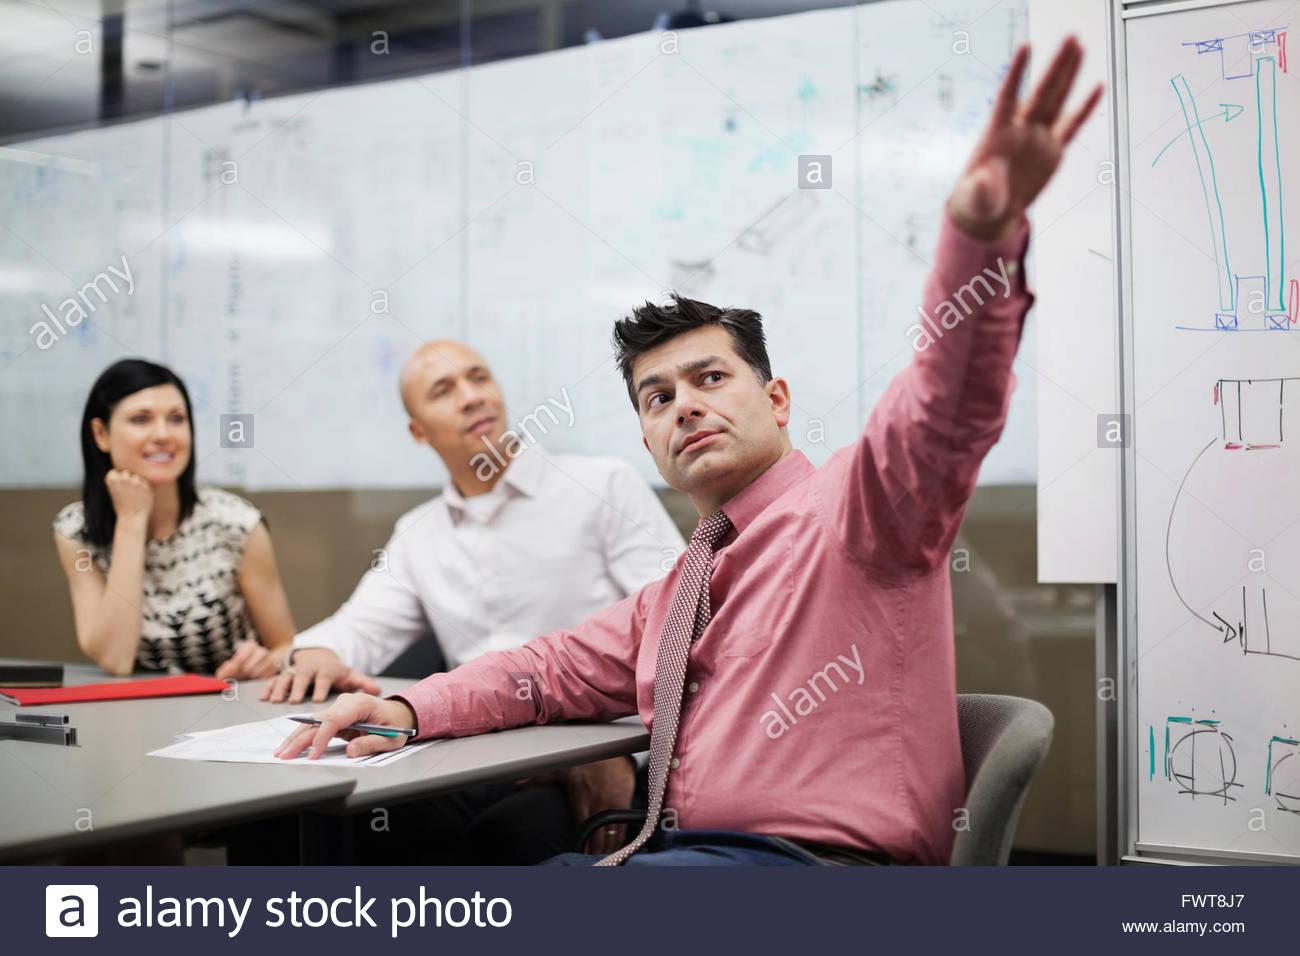 Mature businessman gesturing to white board presentation - Stock Image